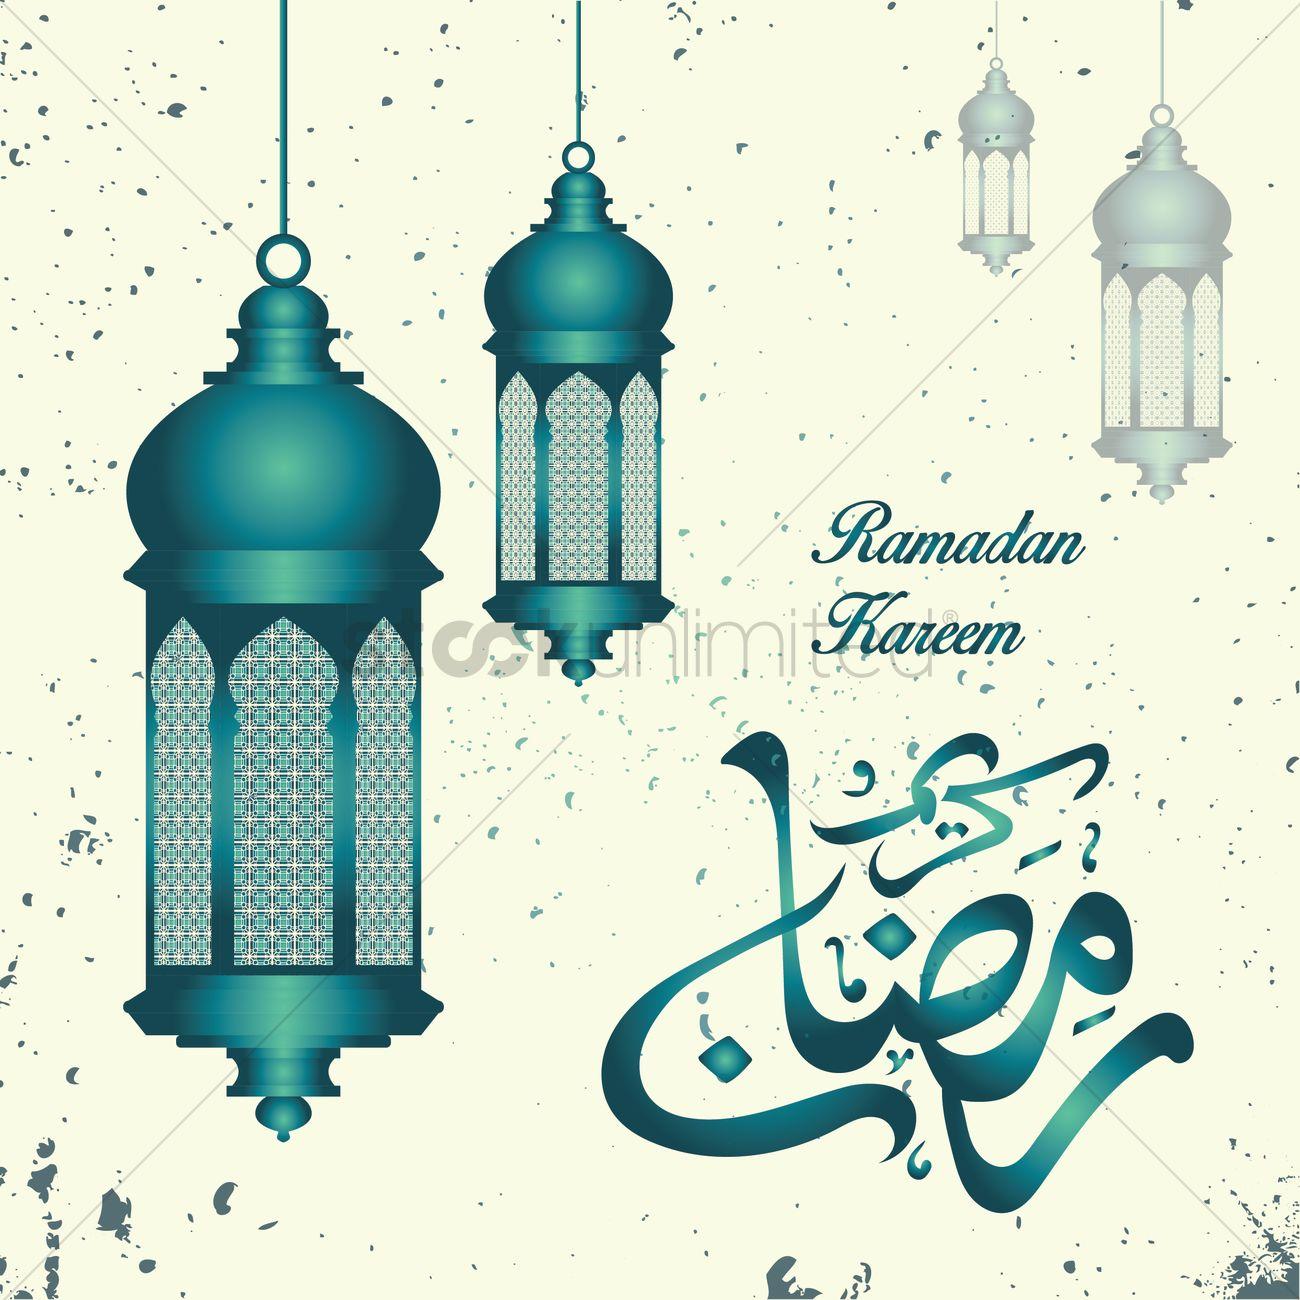 Ramadan Kareem Greeting In Jawi Vector Image 1826932 Stockunlimited